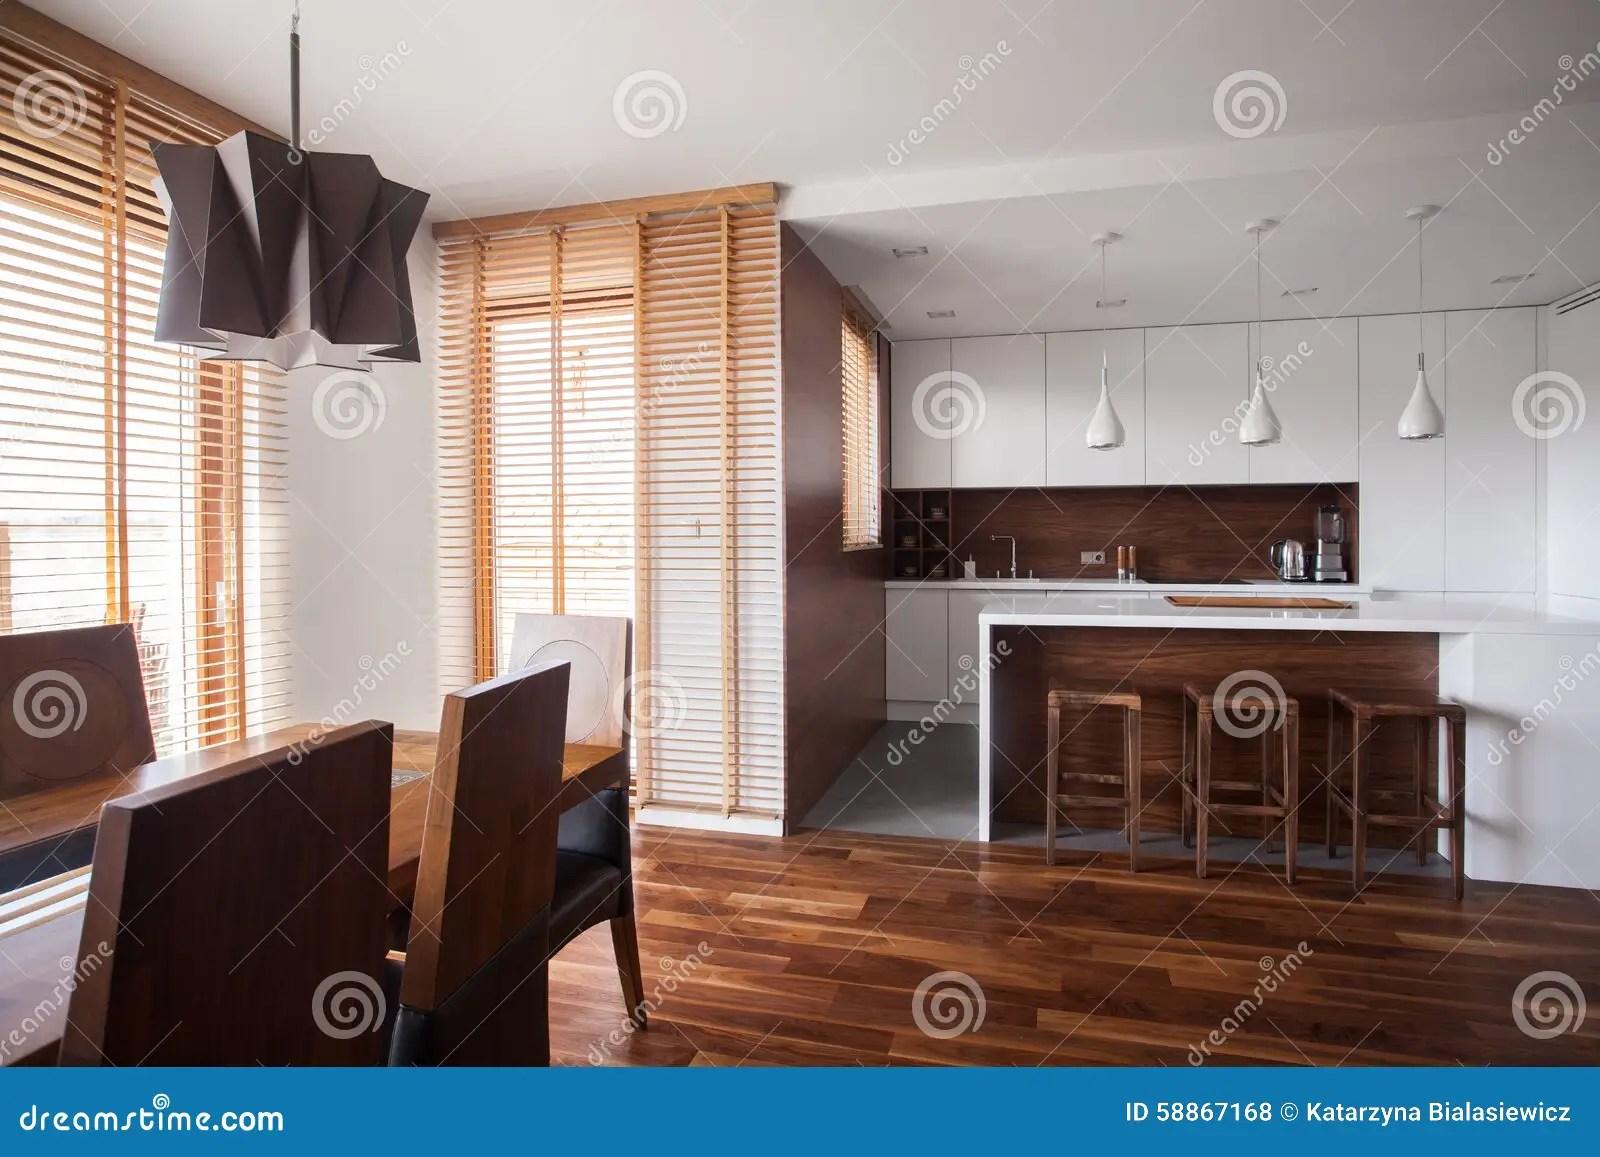 kitchen swags stonewall dark chocolate sea salt caramel sauce 在当代设计房子里打开厨房库存照片 图片包括有样式 椅子 当代 赃物 在当代设计房子里打开厨房